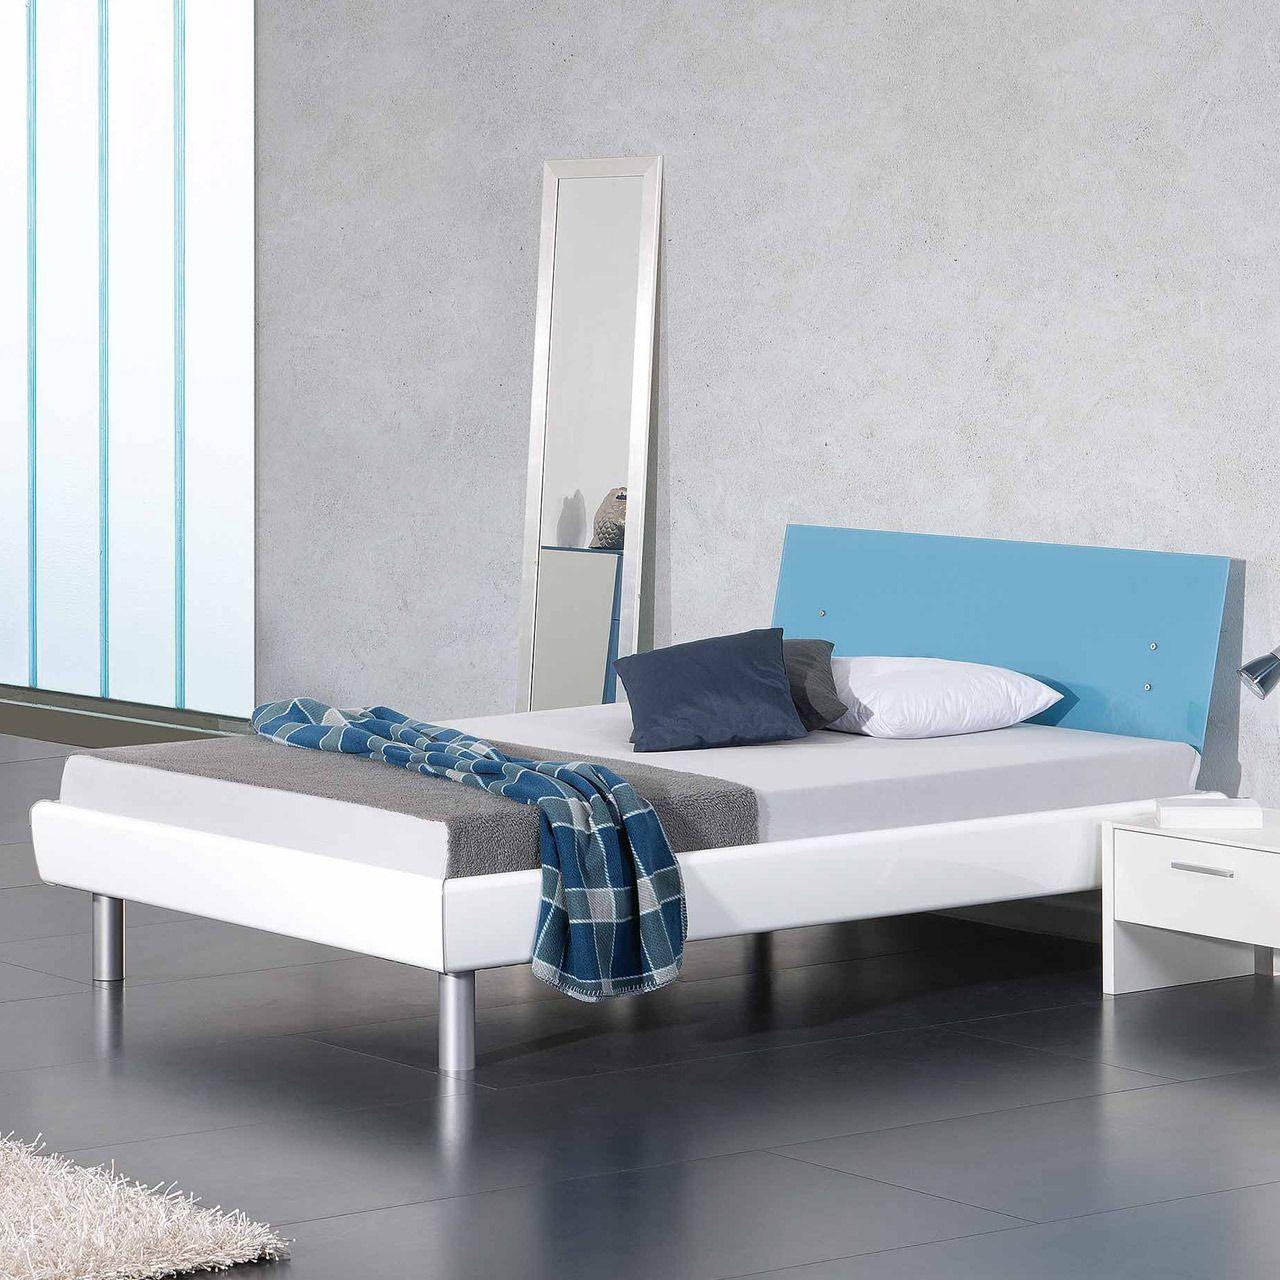 Modular Colorado Fiore In 2020 Holzbett Holzbetten Weisses Bett